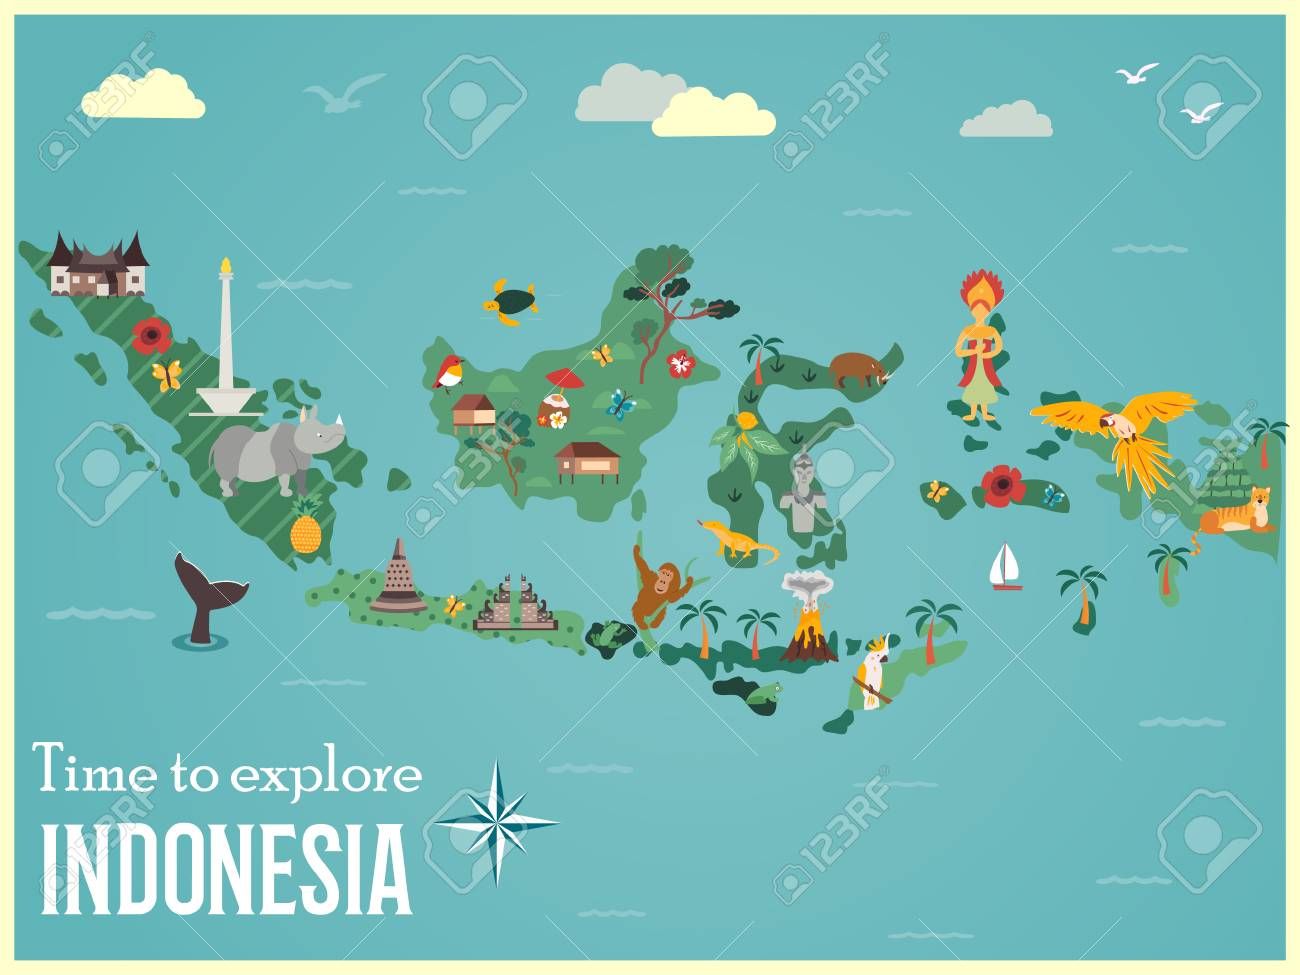 Indonesian map with animals and landmarks on arabia map, far east map, nigeria map, drc map, europe map, bali map, new zealand, papua new guinea map, israel map, irian jaya map, south korea, japan map, tunisia map, sumatra map, china map, the balkans map, mexico map, poland map, asia map, haiti map, latin america map, sri lanka map,